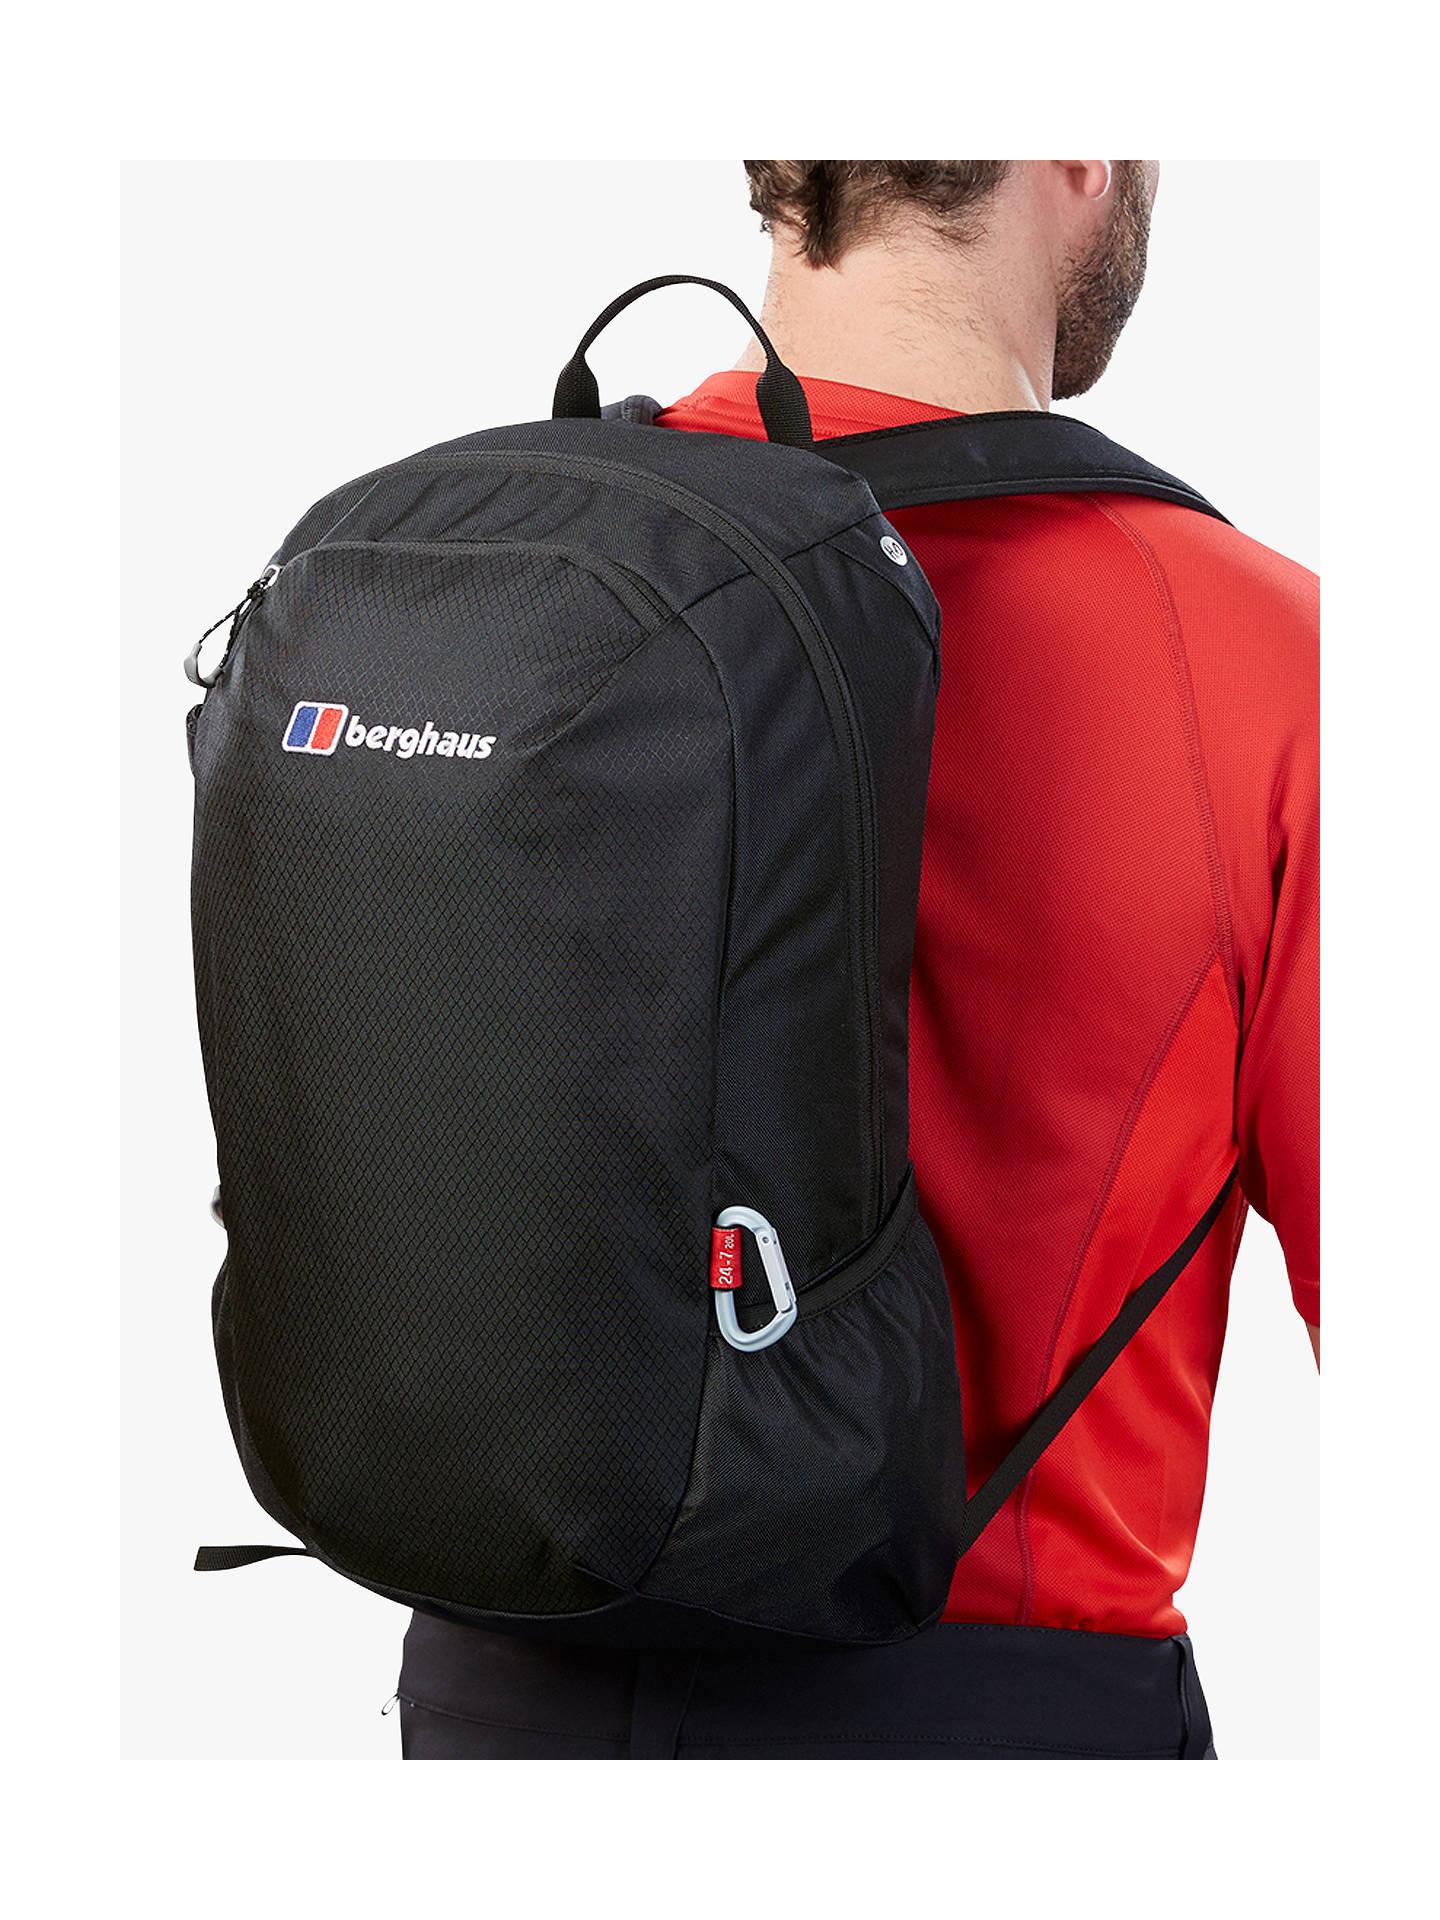 48292ca84 ... Buy Berghaus Twentyfourseven+ 20 Backpack, Black Online at  johnlewis.com ...